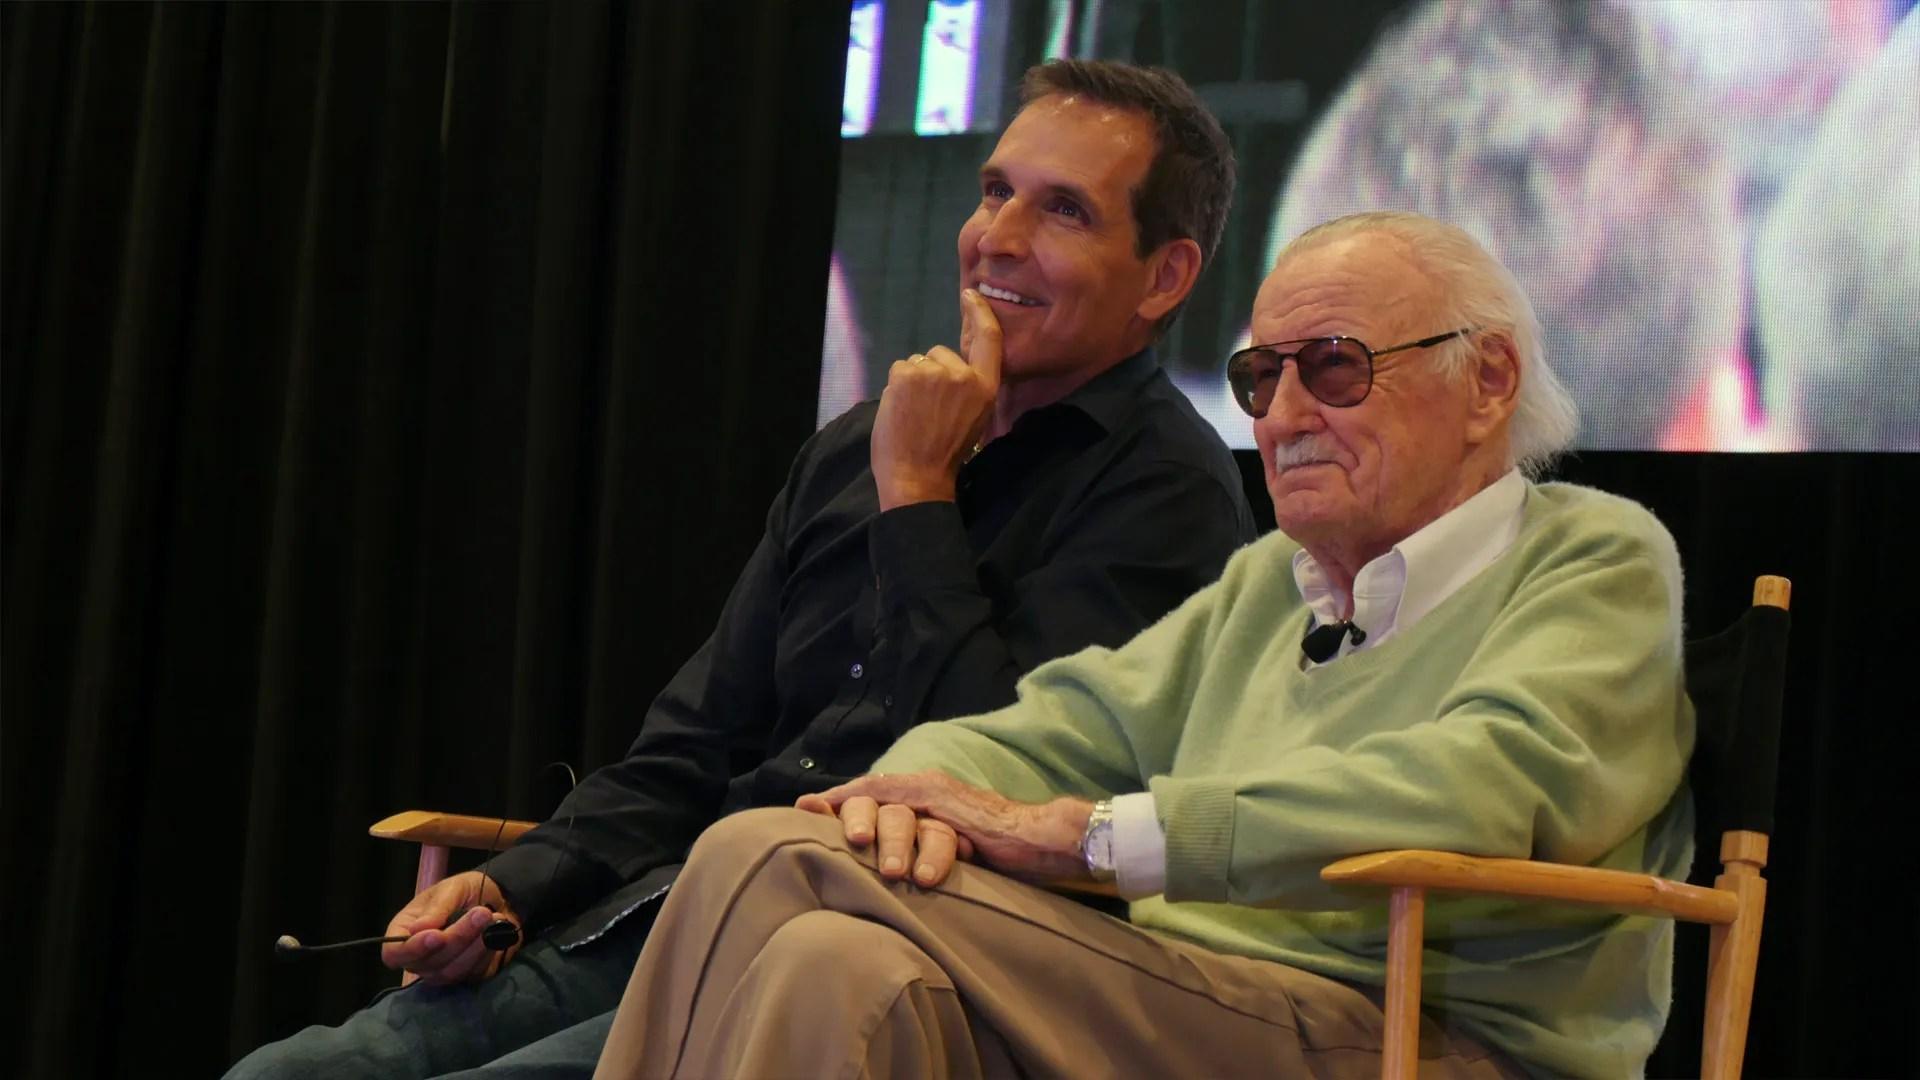 Todd McFarlane remembers Marvel Comics legend Stan Lee